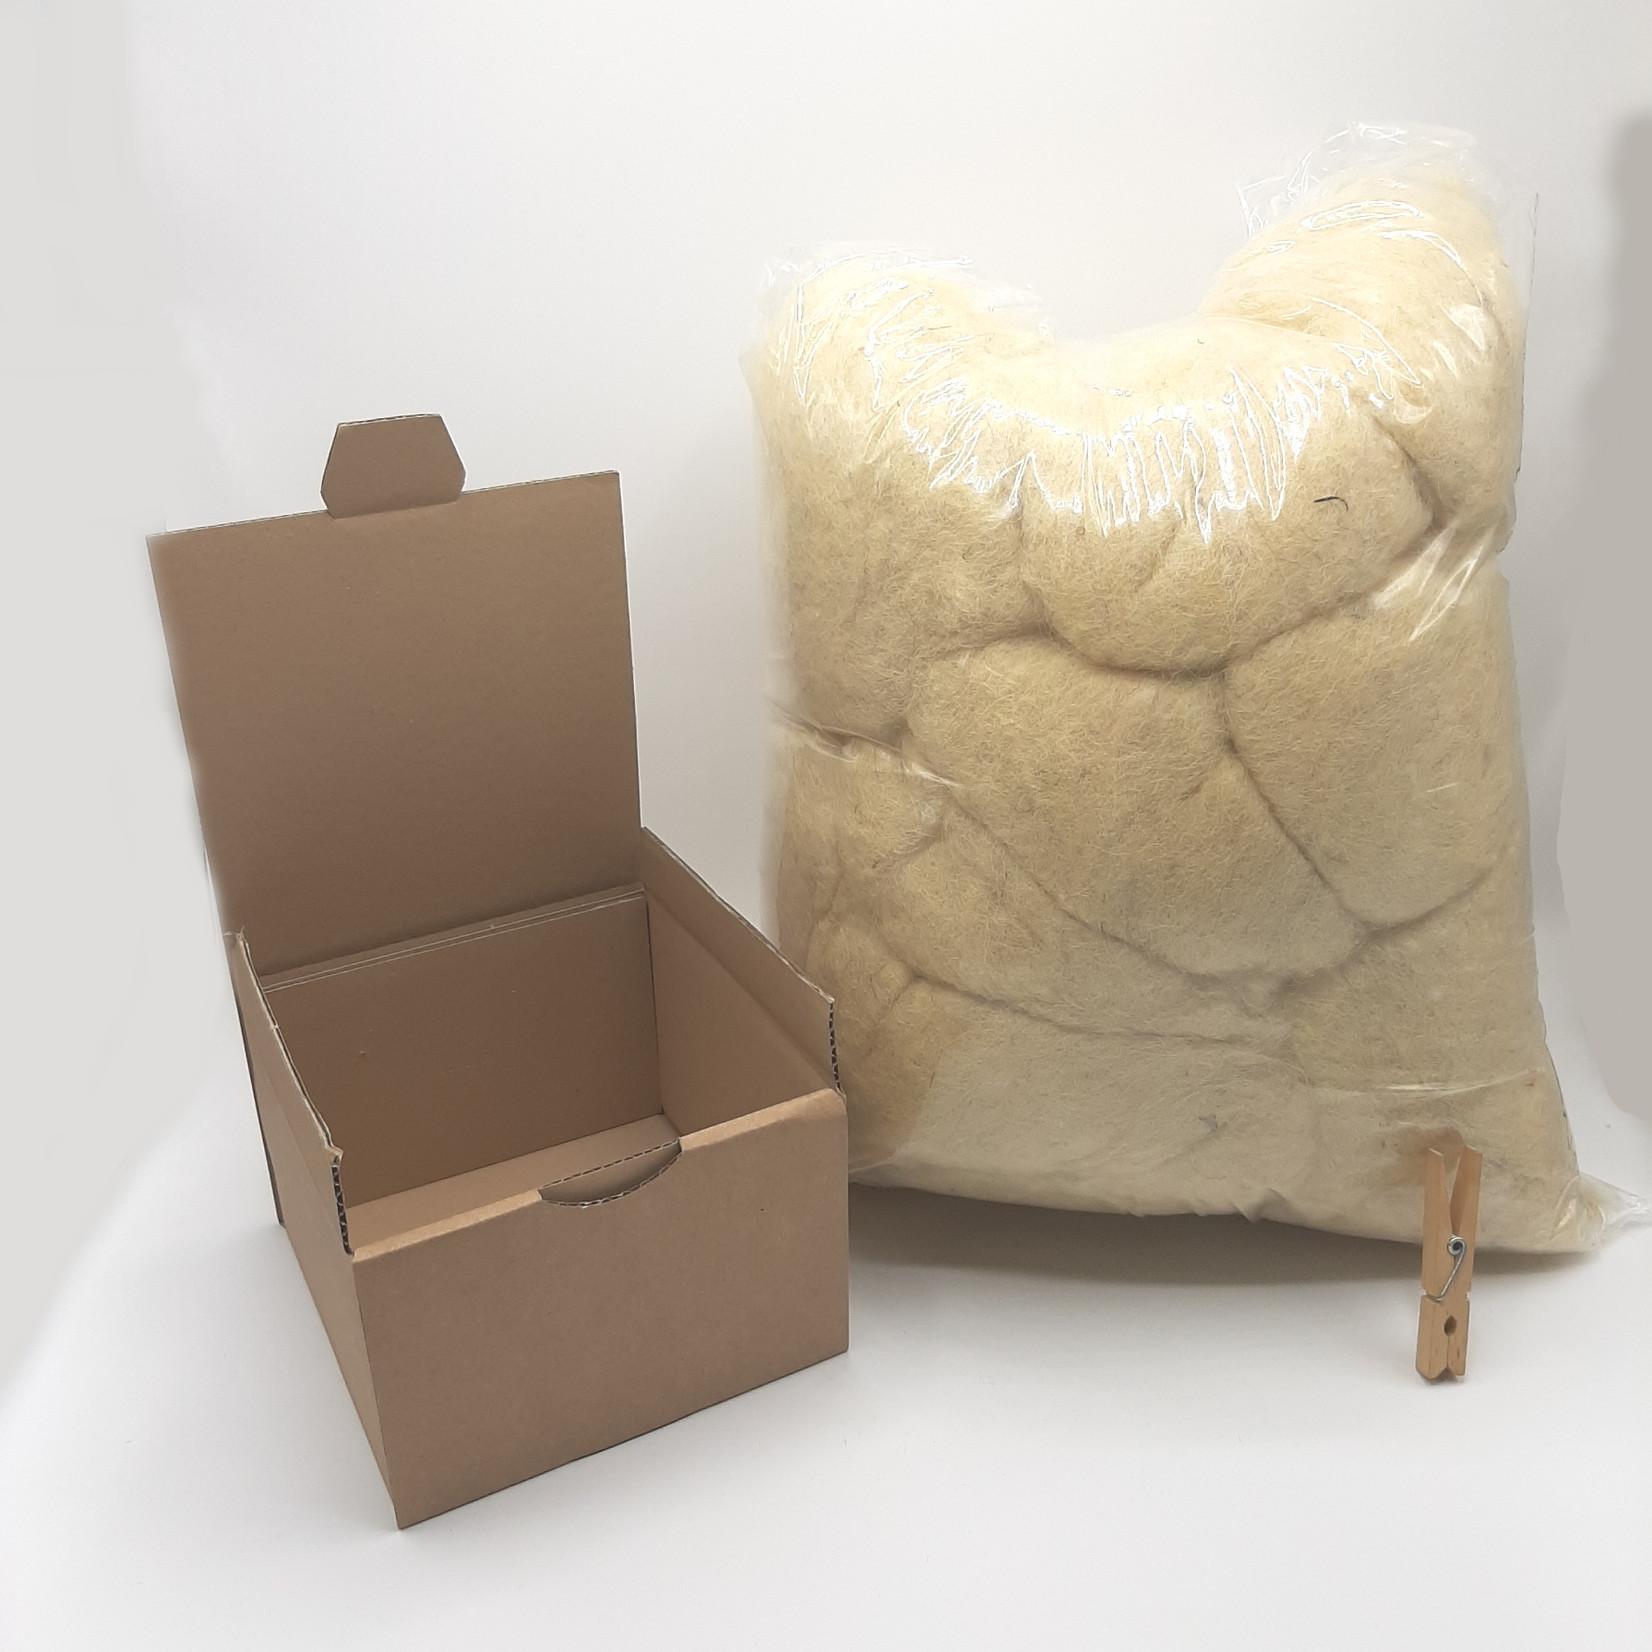 HollandWool vulwol 1000 gram - 100% wol - Nederlandse gewassen, gekaarde Schapenwol MELEE, licht ingevet, roomwit